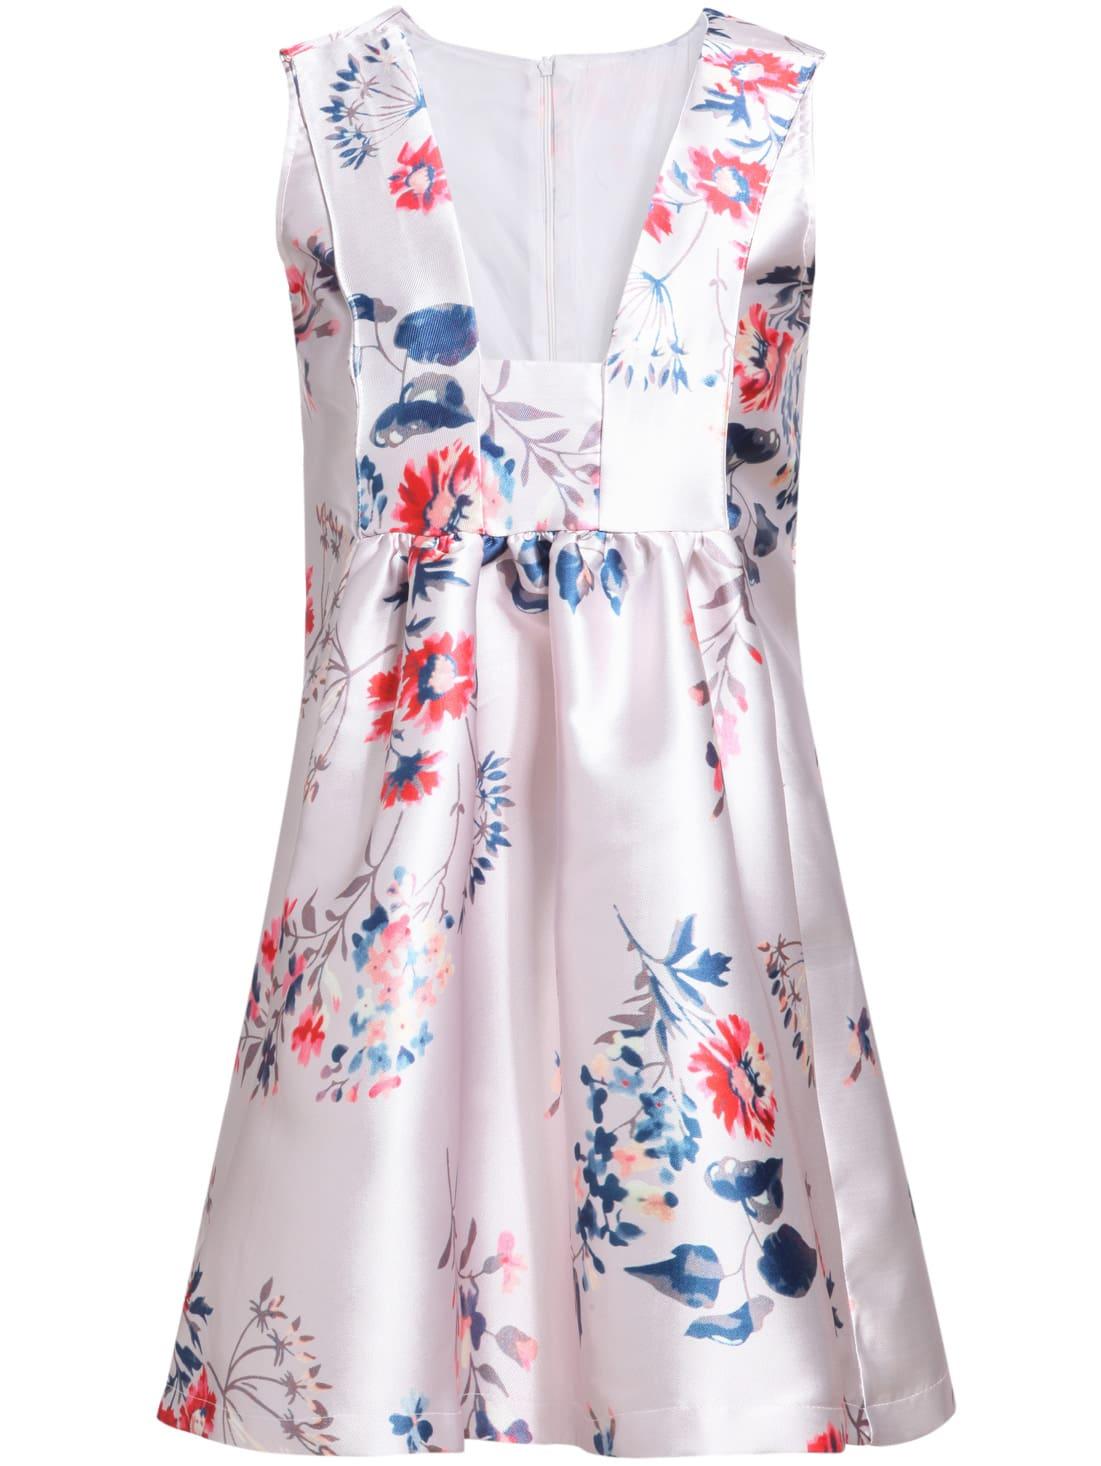 Multicolour V Neck Sleeveless Floral Slim DressMulticolour V Neck Sleeveless Floral Slim Dress<br><br>color: Multicolor<br>size: M